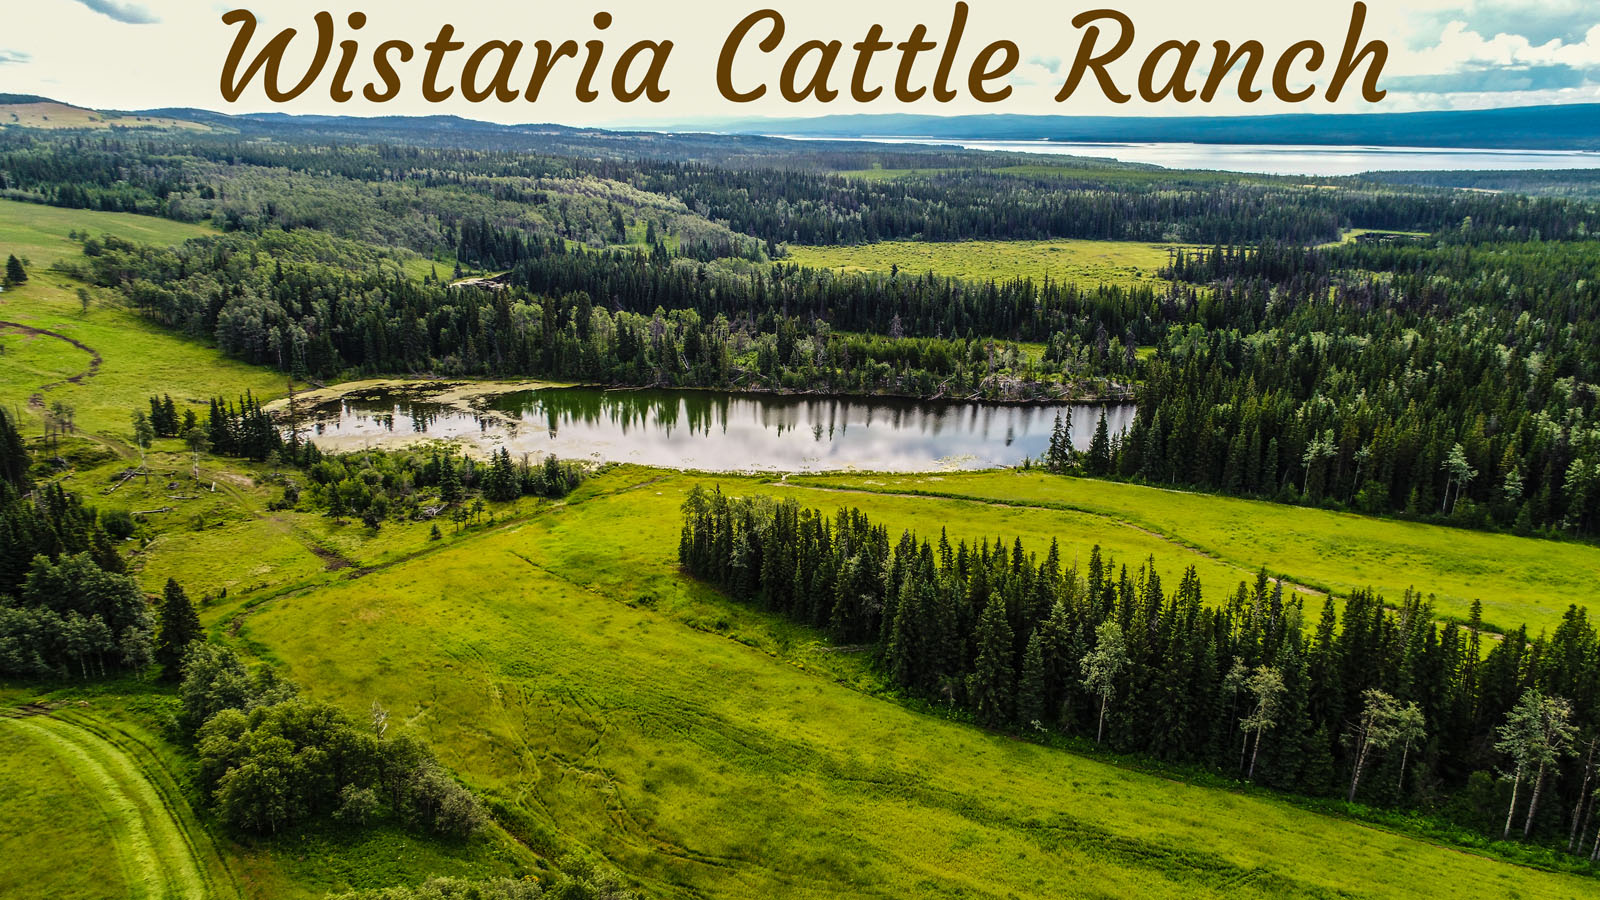 Wistaria cattle ranch 56